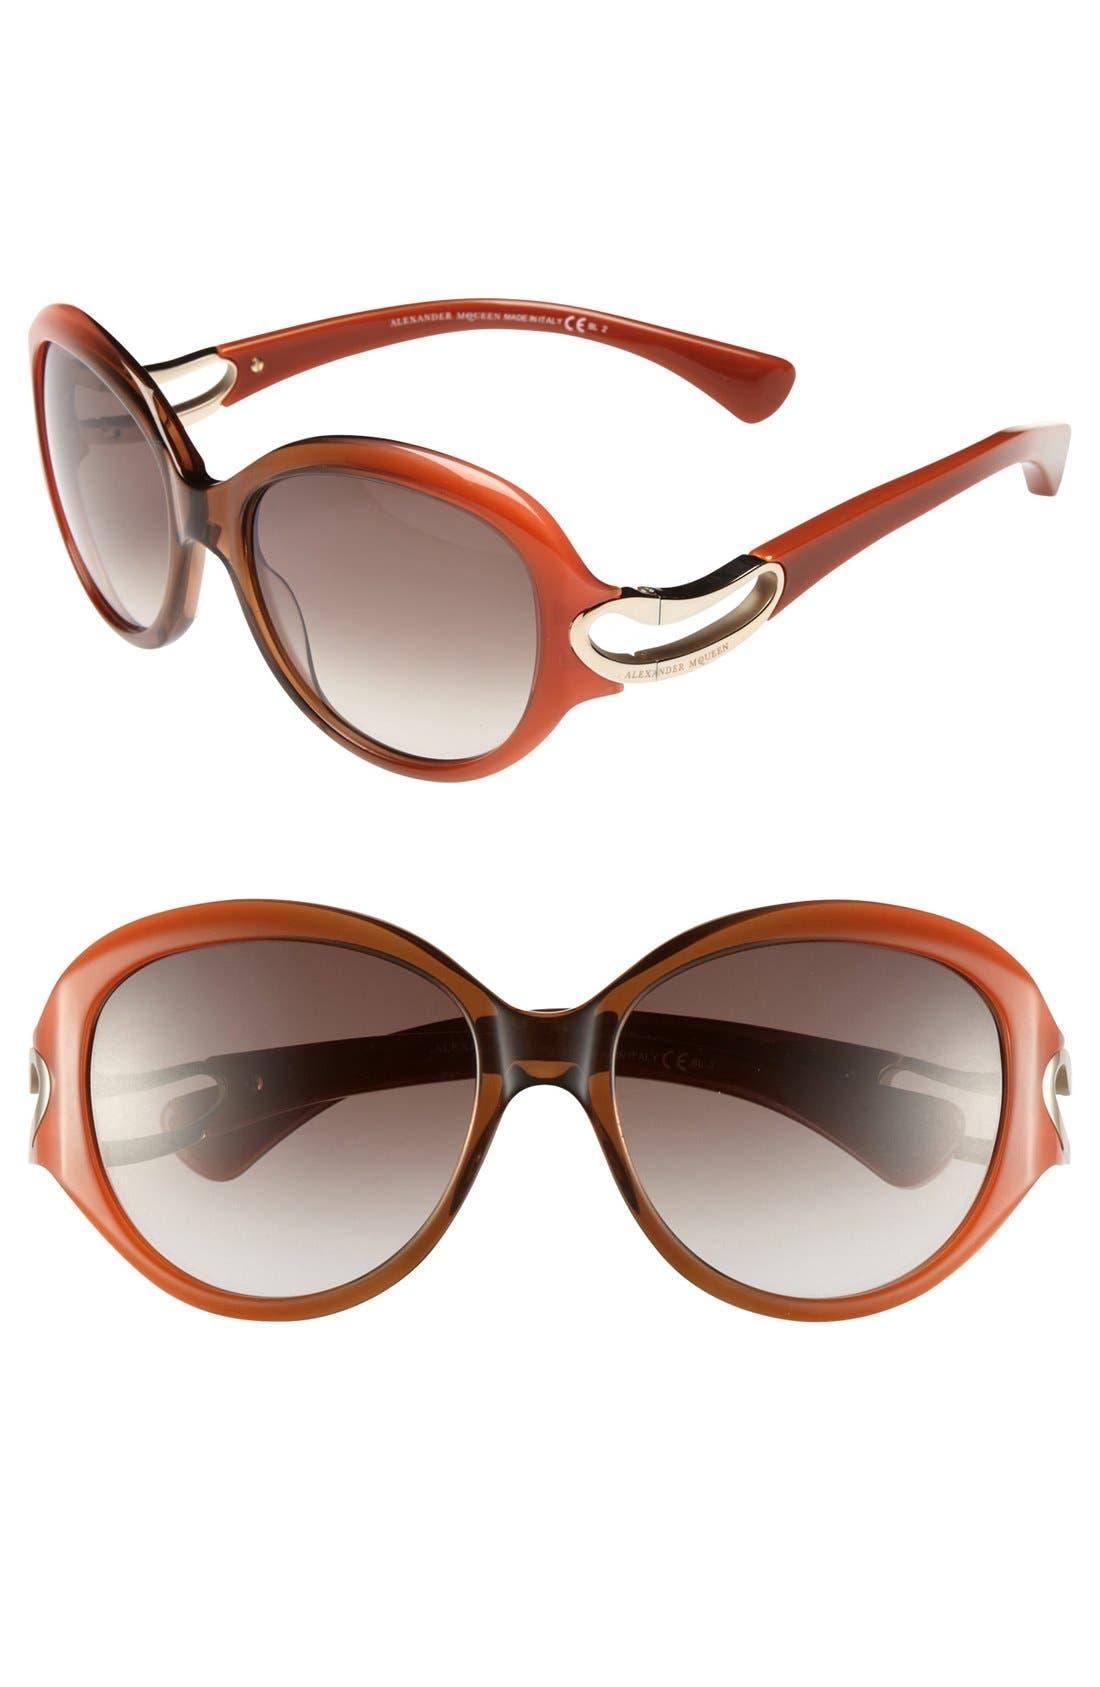 Alternate Image 1 Selected - Alexander McQueen 56mm Retro Sunglasses